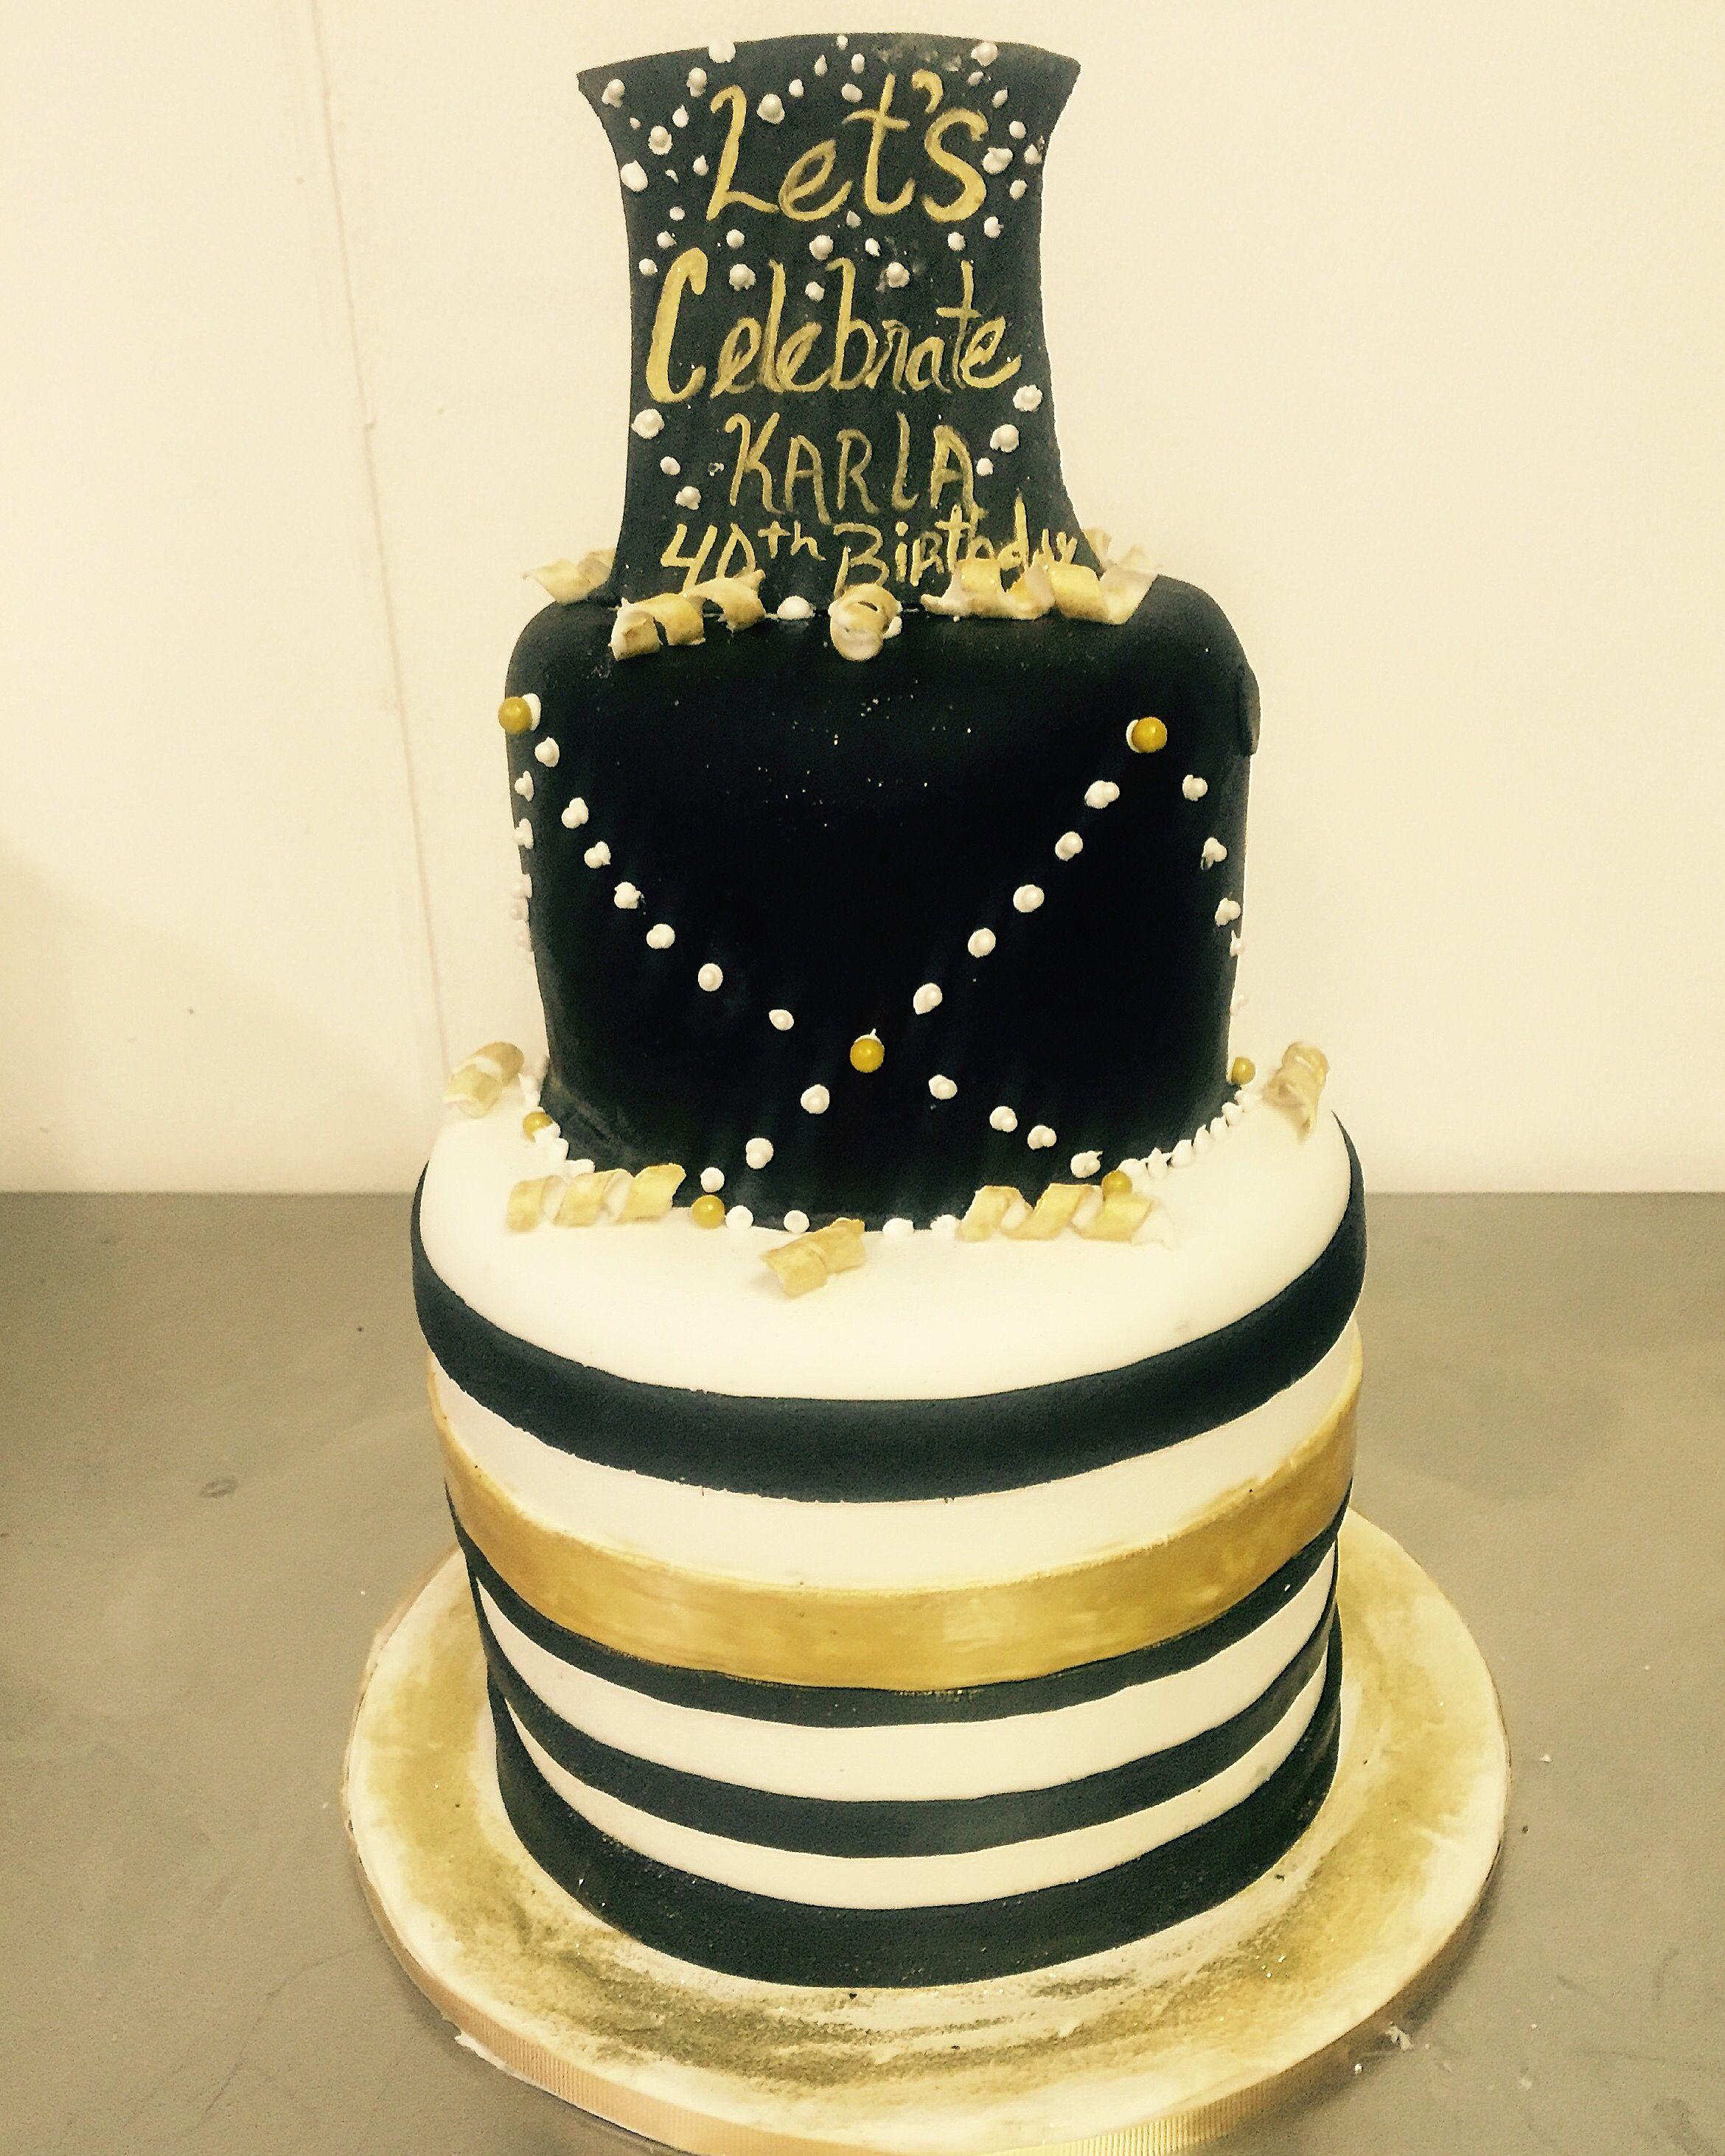 Pin by CupCake Salon on Cakes by CupCake Salon   Pinterest   Cake